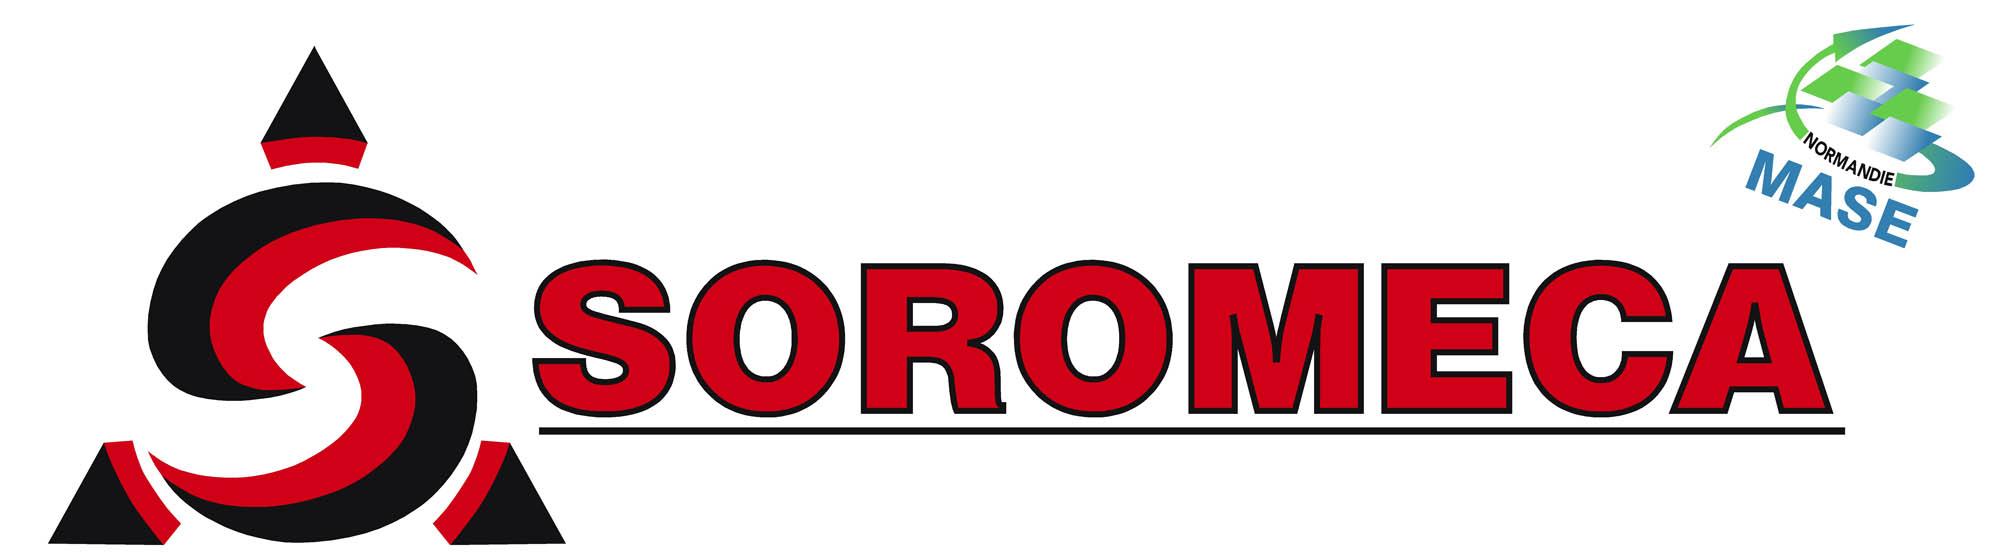 https://www.soromeca.com/wp-content/uploads/2020/06/soromeca-mase.jpg